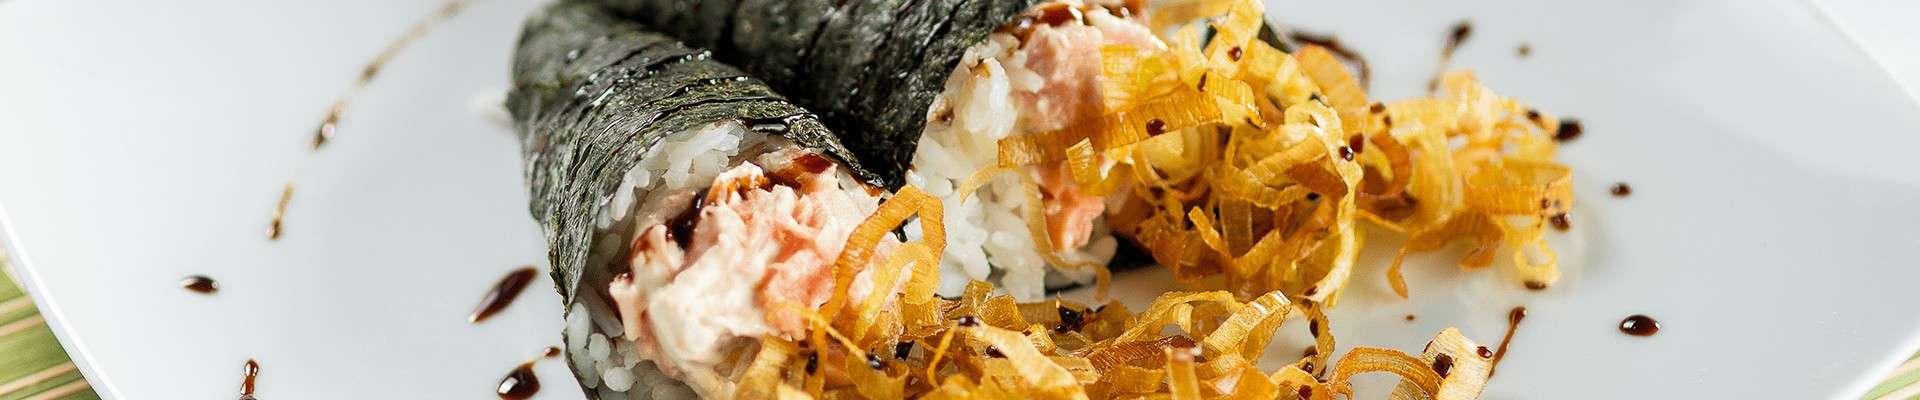 Poro Maki Sushi com Cream Cheese Catupiry